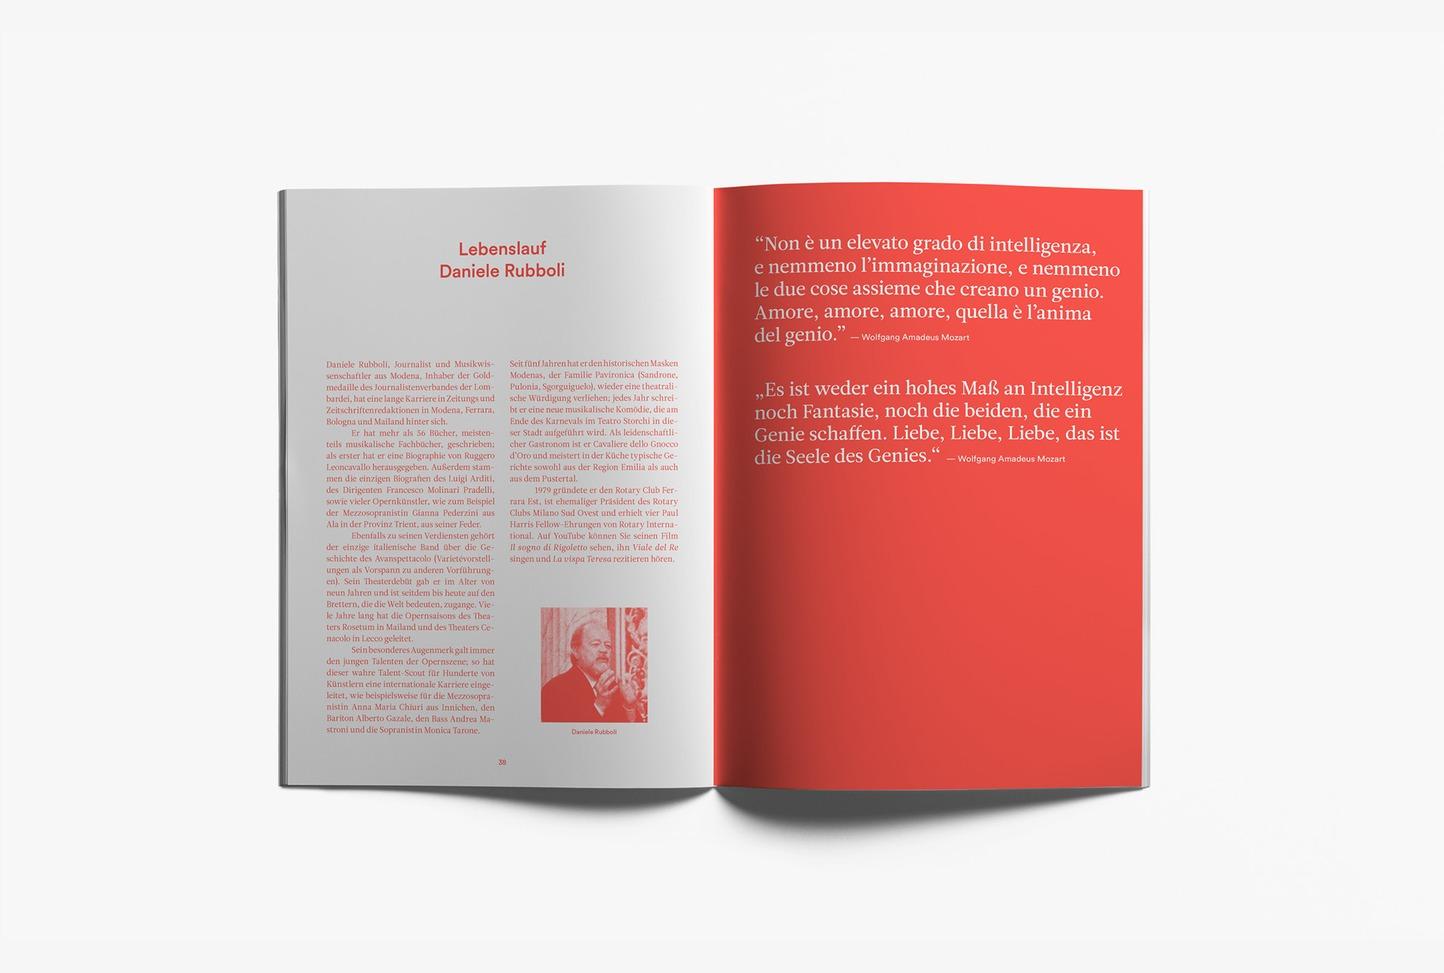 Pubblicazione / Publication